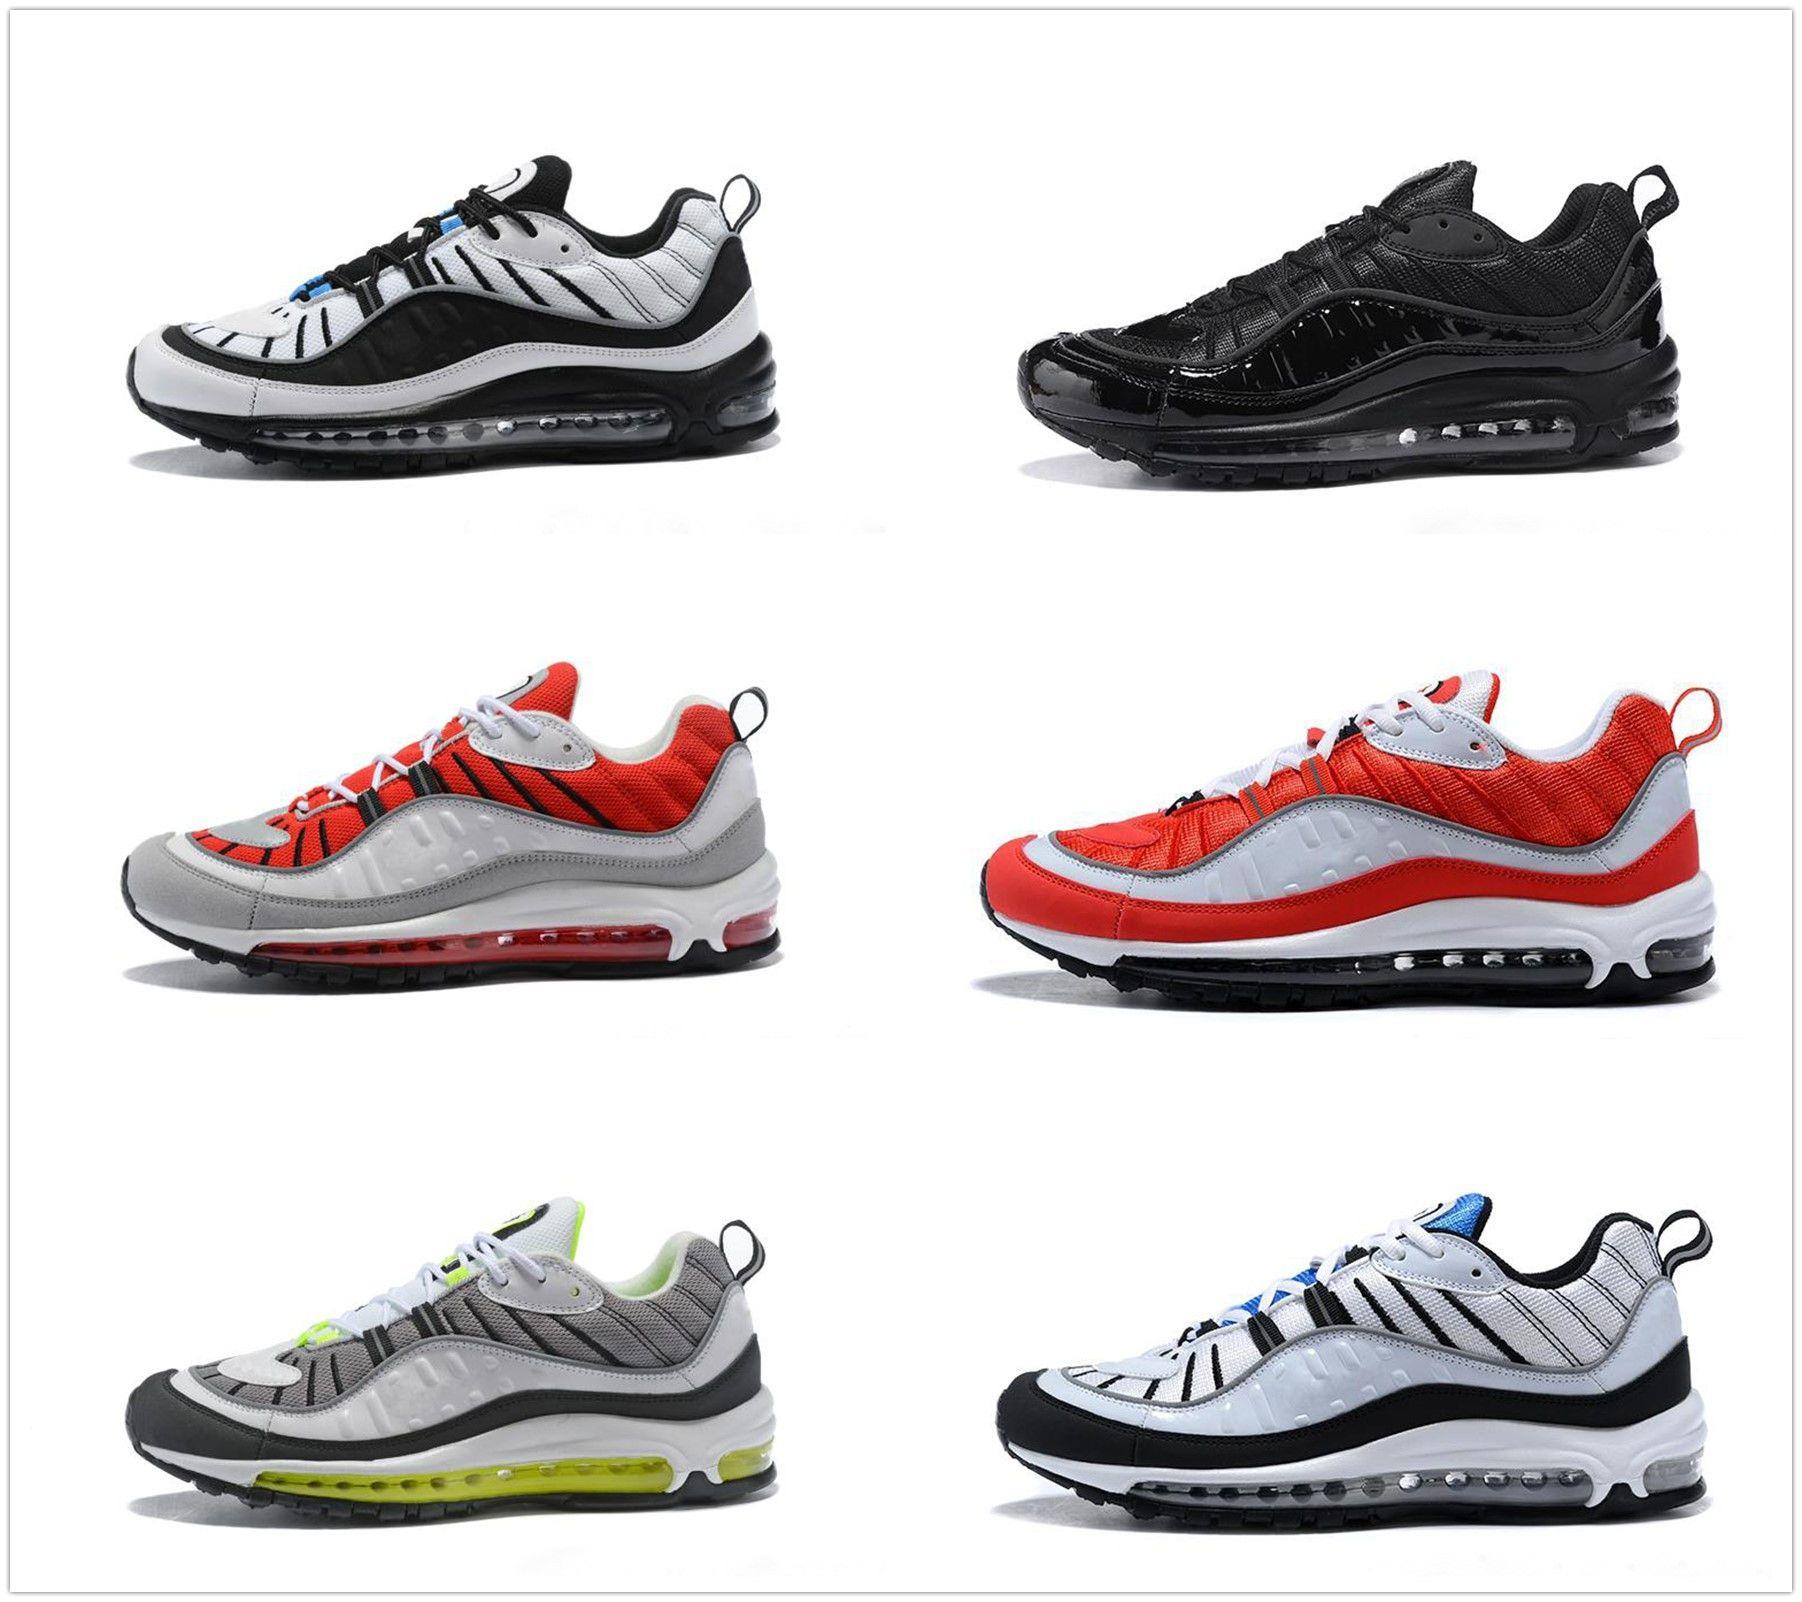 reputable site 08dd7 0bf8f Großhandel Nike Air Max 98 Airmax 98 OG Gundam Red Blue Silver Bullet 98  Schuhe Herren Sneakers 2018 Weiß Laufschuhe Mode Retro Marke Sport Sneakers  Größe 7 ...